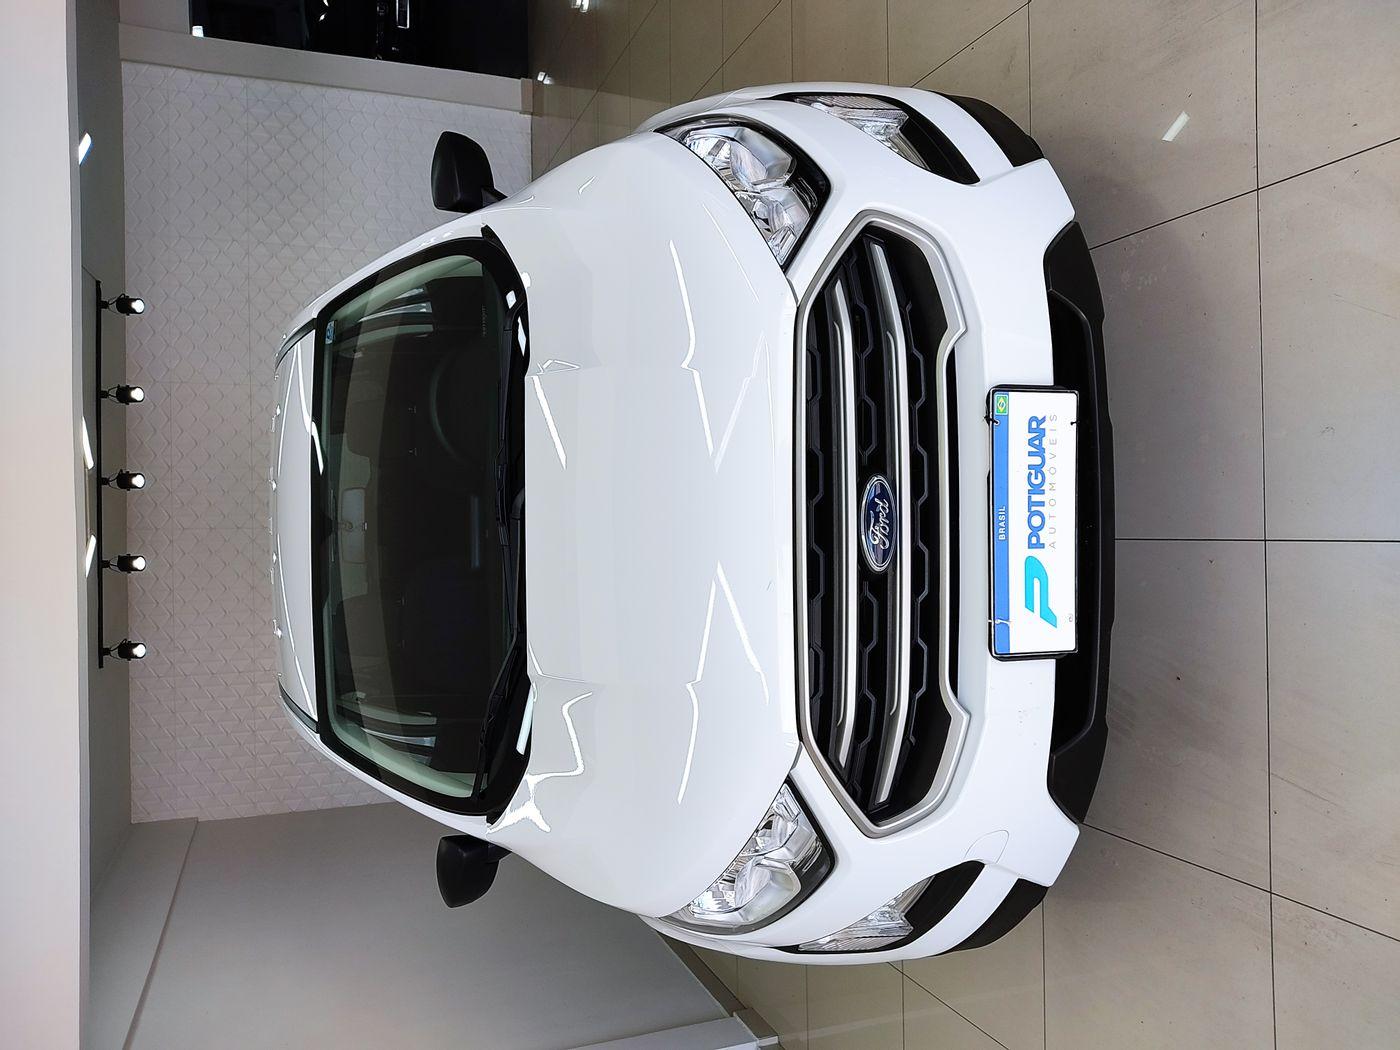 Ford EcoSport SE 1.5 12V Flex 5p Aut.